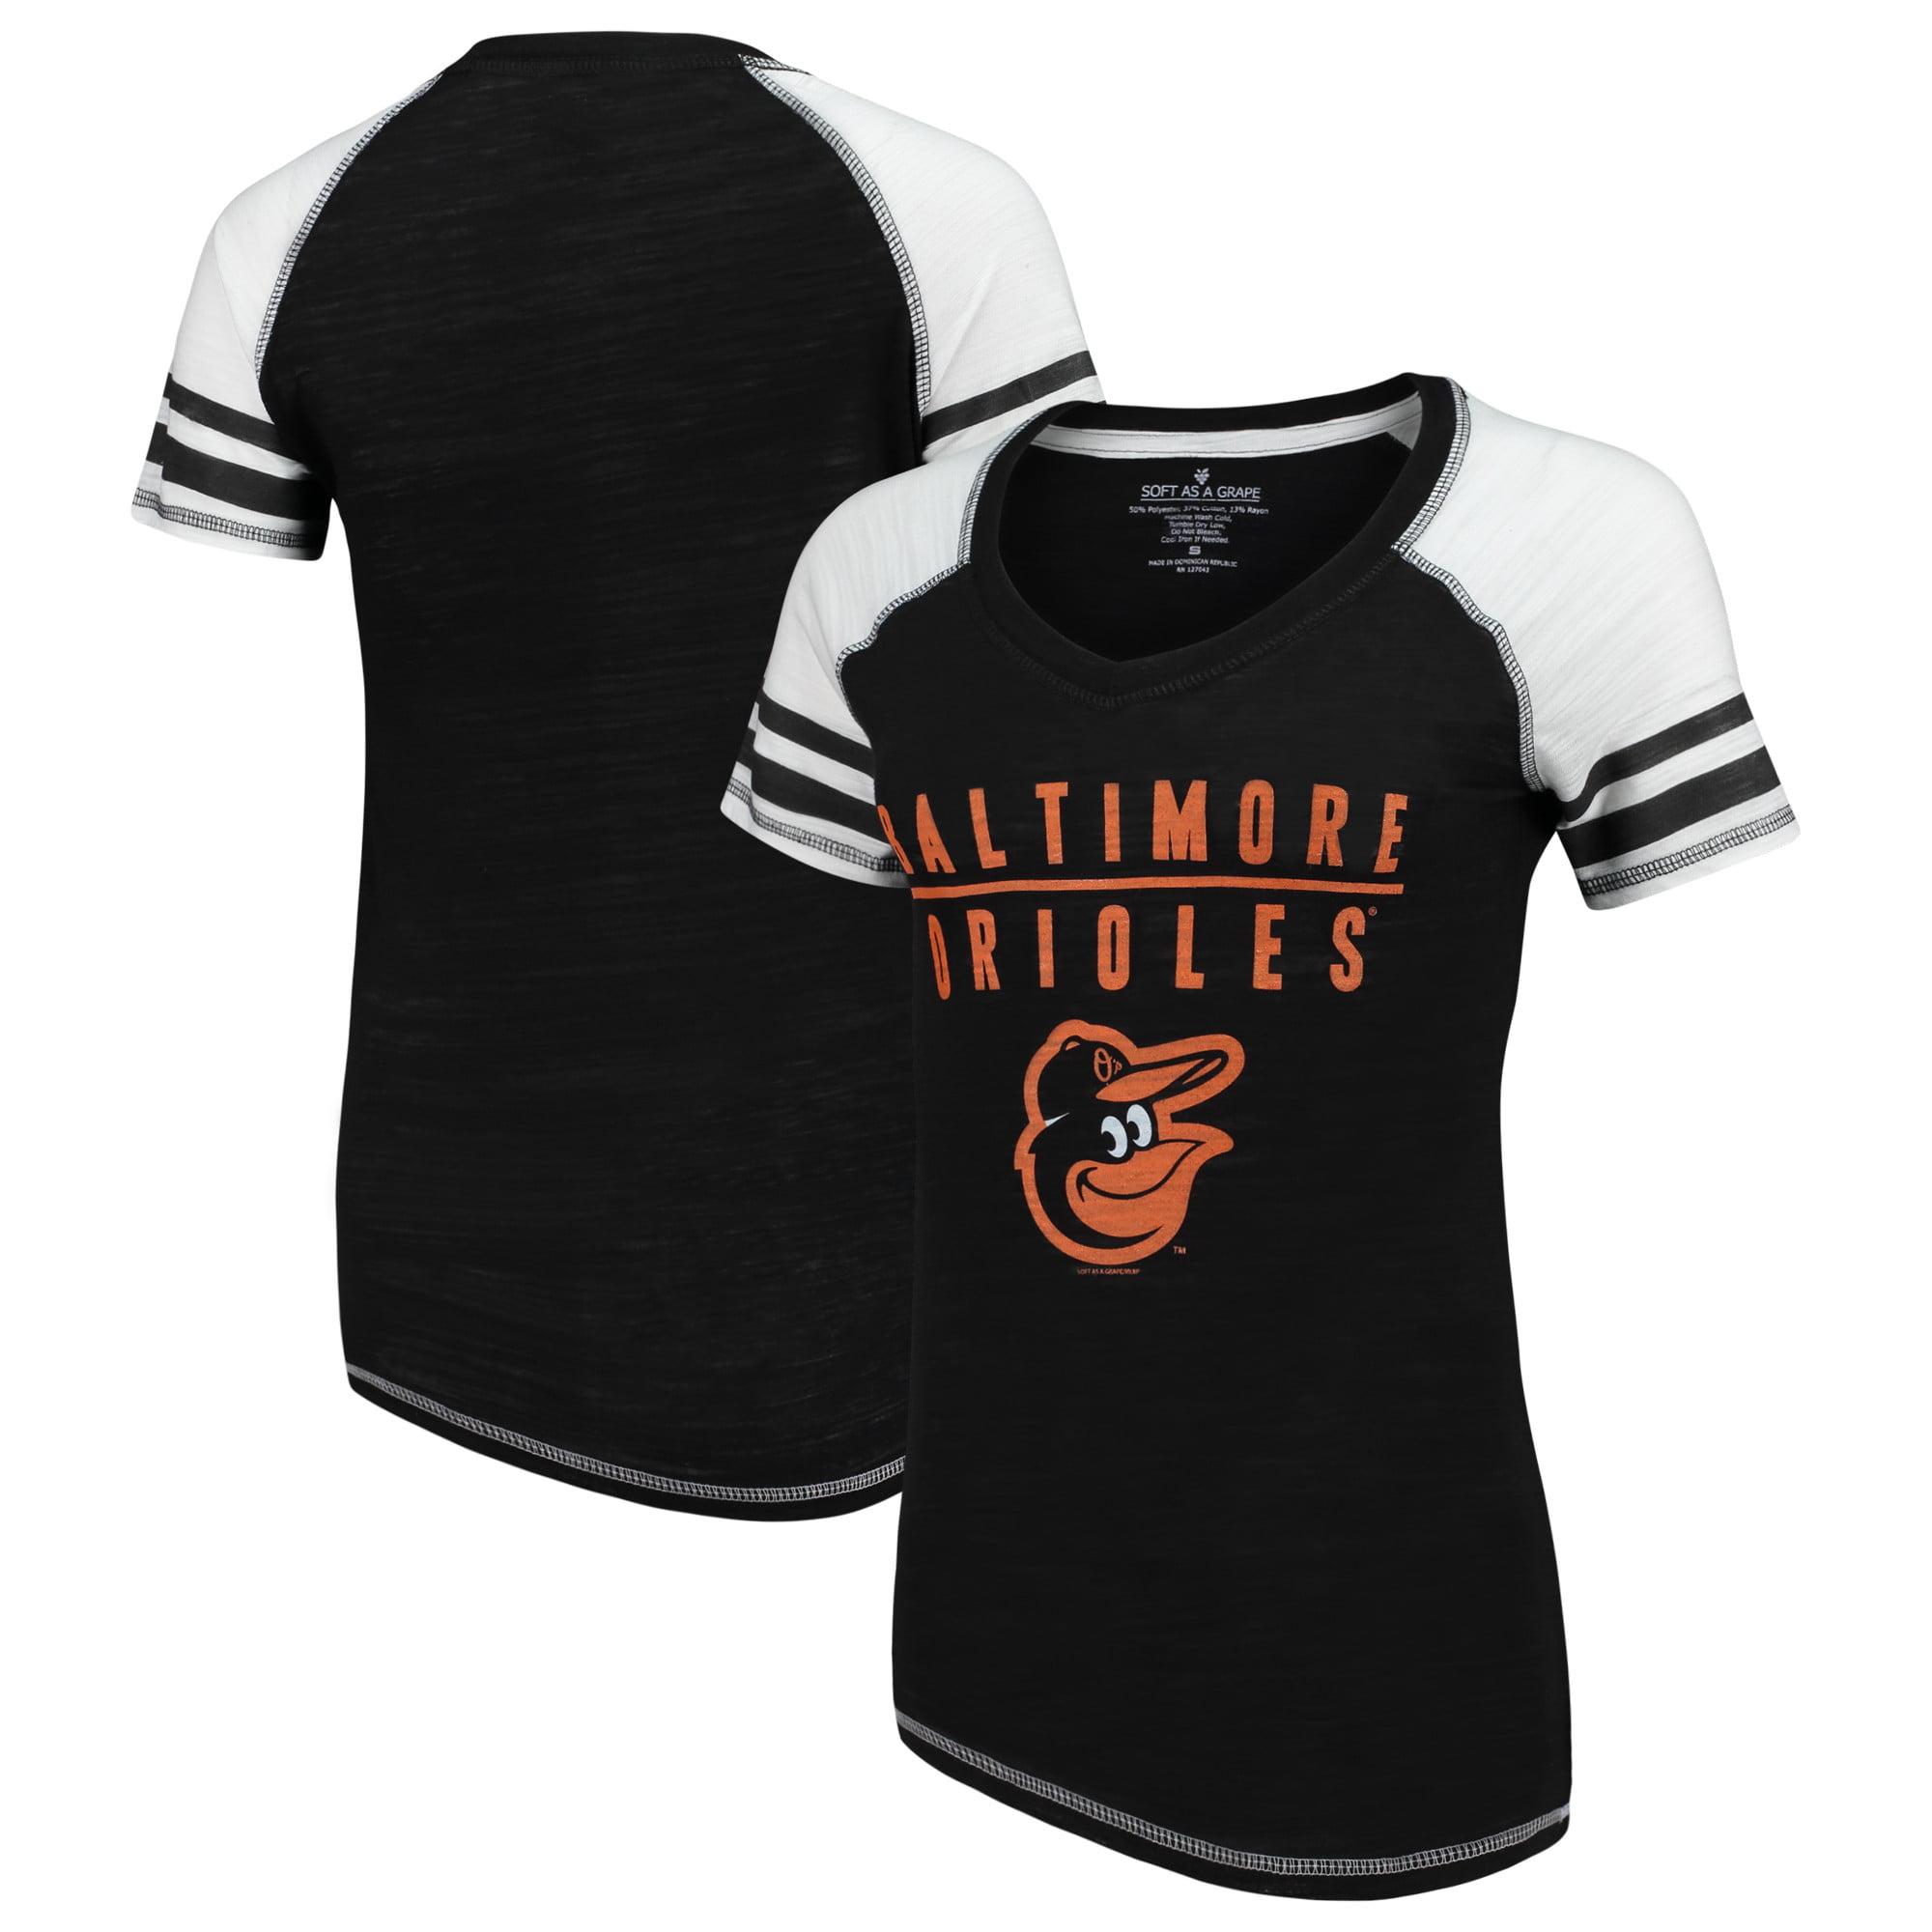 Baltimore Orioles Soft as a Grape Women's Color Block V-Neck T-Shirt - Black